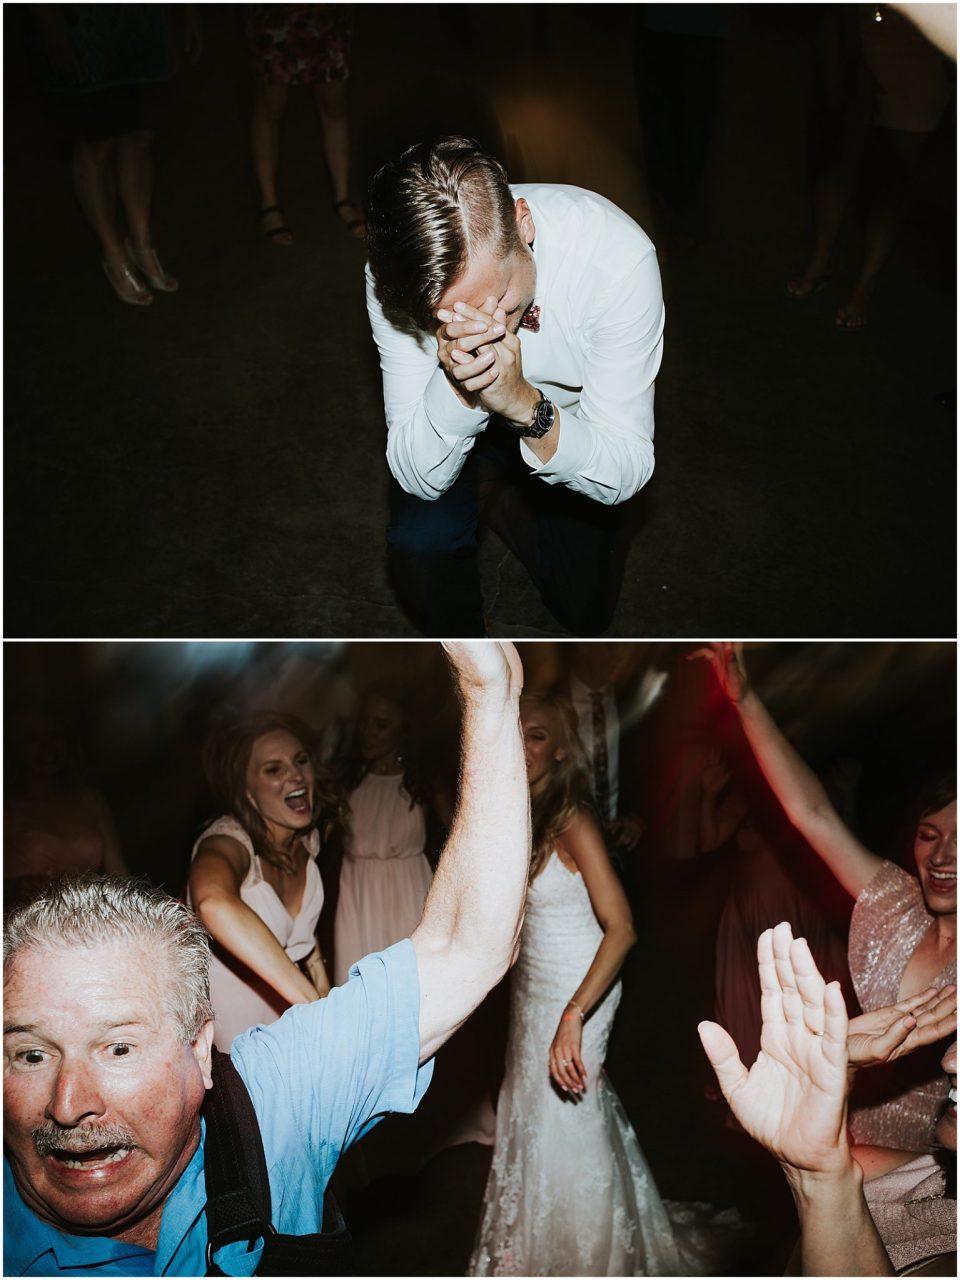 caitlin-dillon-dance-fest-sullivan-and-sullivan (89 of 131)_seattle wedding.jpg